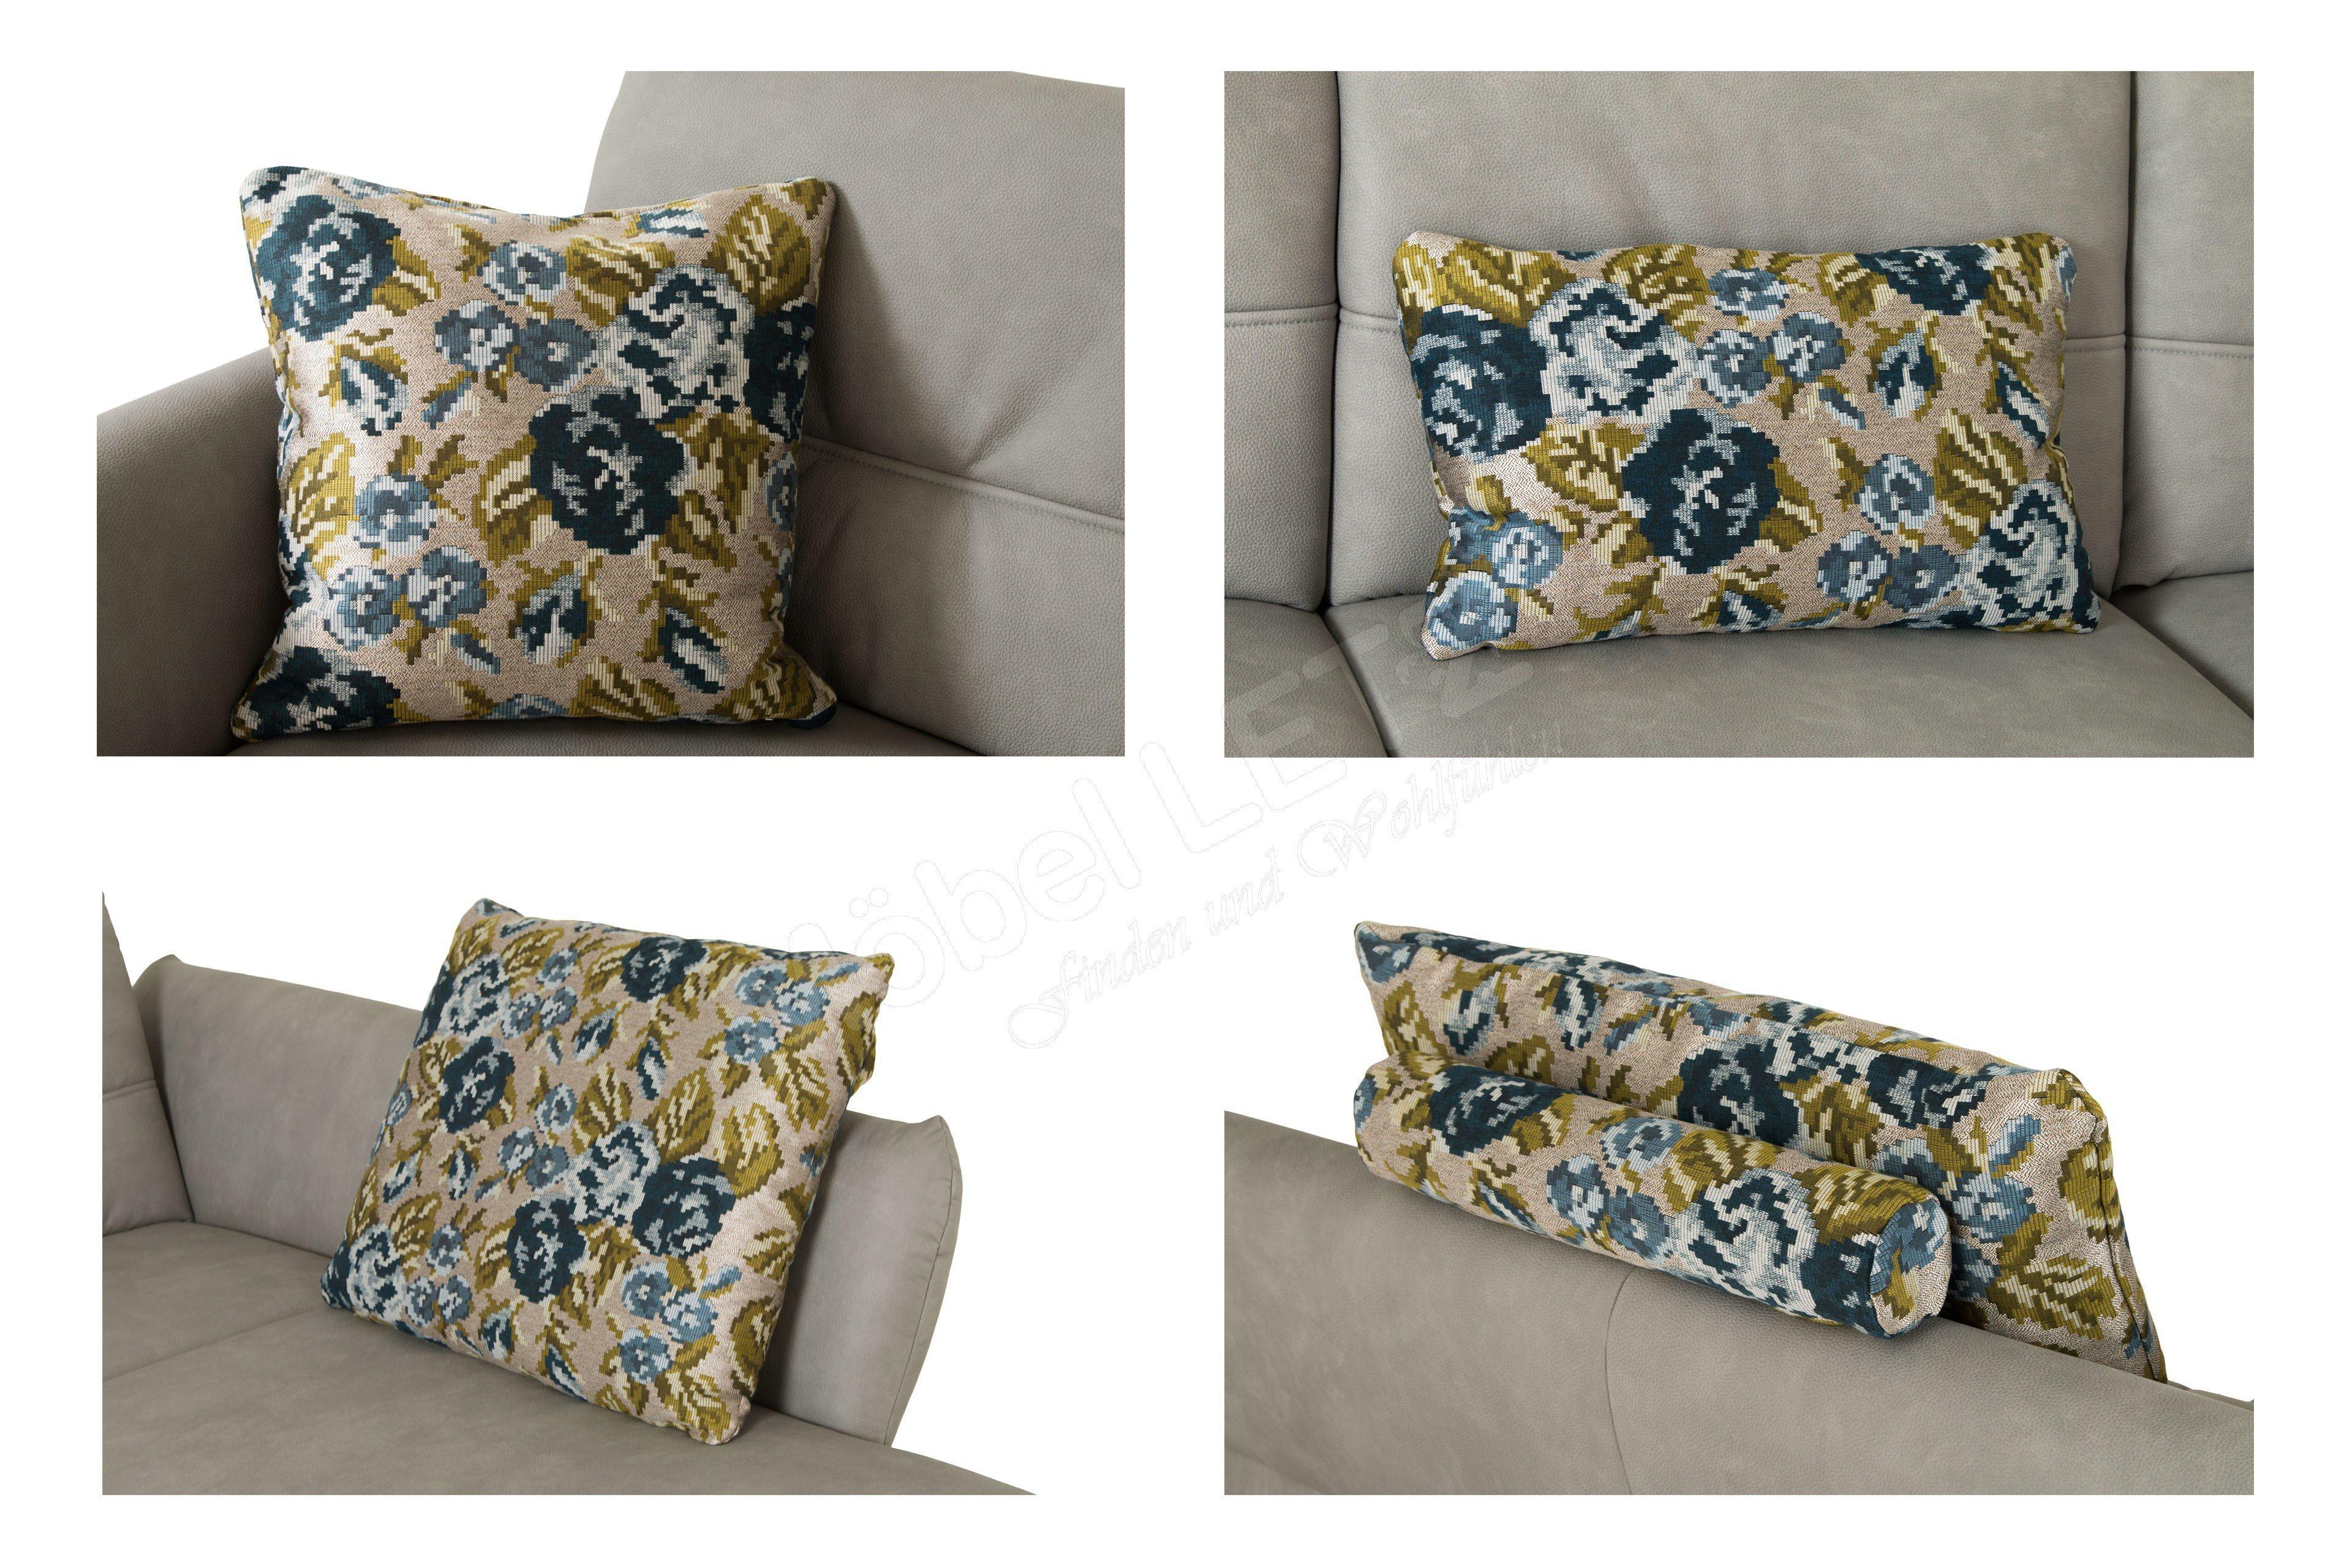 f s polsterm bel 306 mezzo ecksofa in grau m bel letz ihr online shop. Black Bedroom Furniture Sets. Home Design Ideas